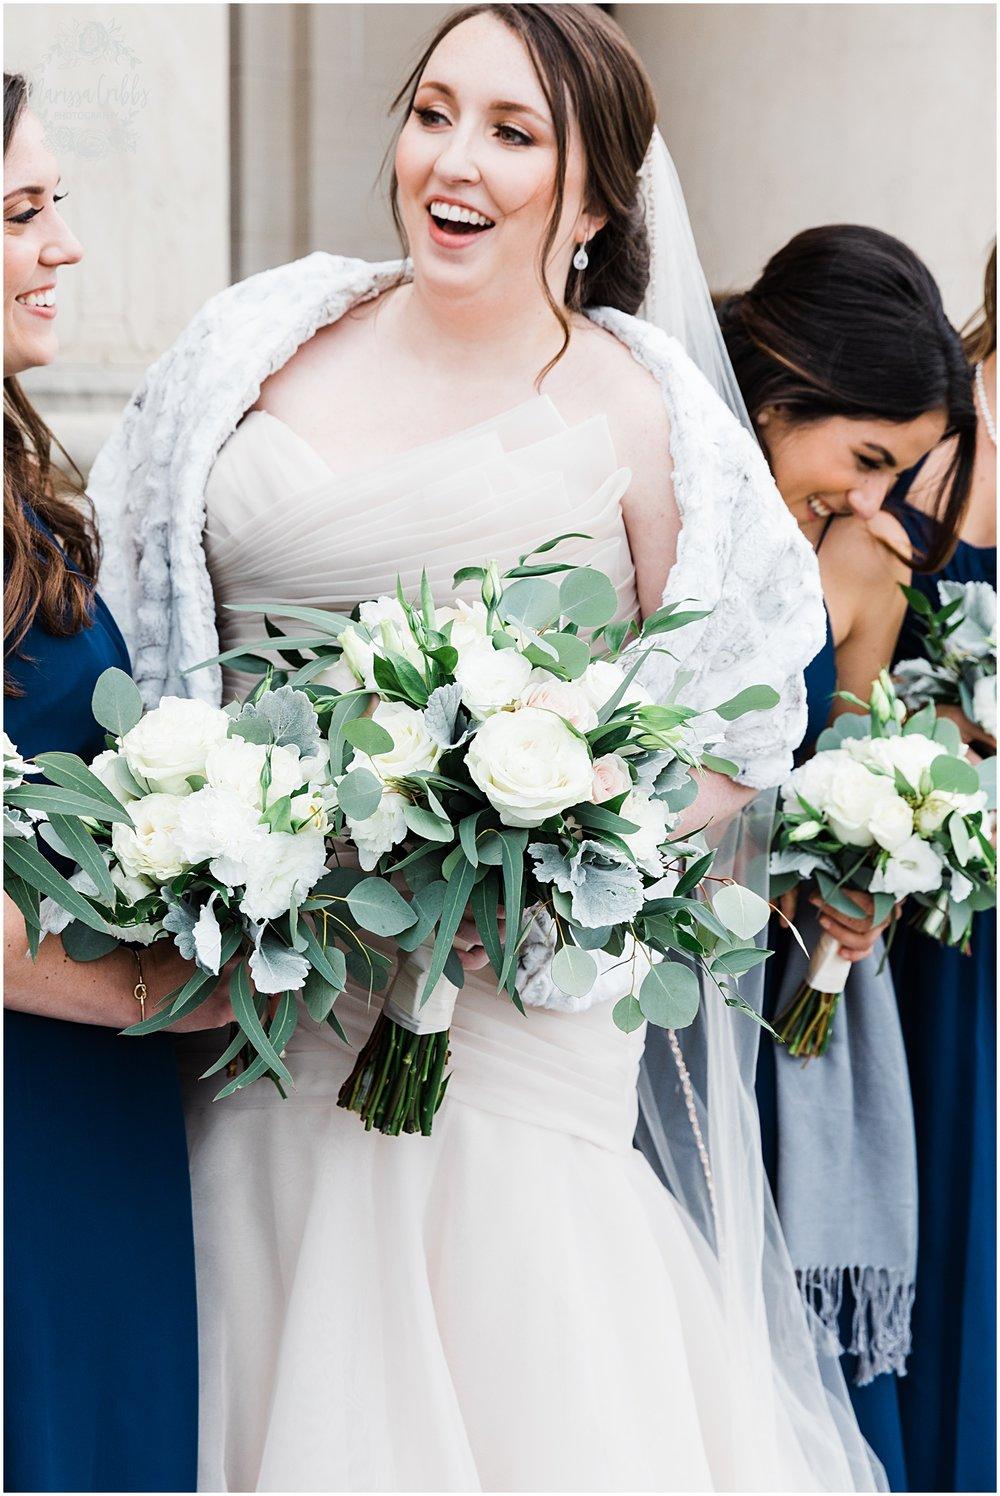 JULIA & AUSTIN MADRID THEATRE WEDDING | MARISSA CRIBBS PHOTOGRAPHY_7095.jpg